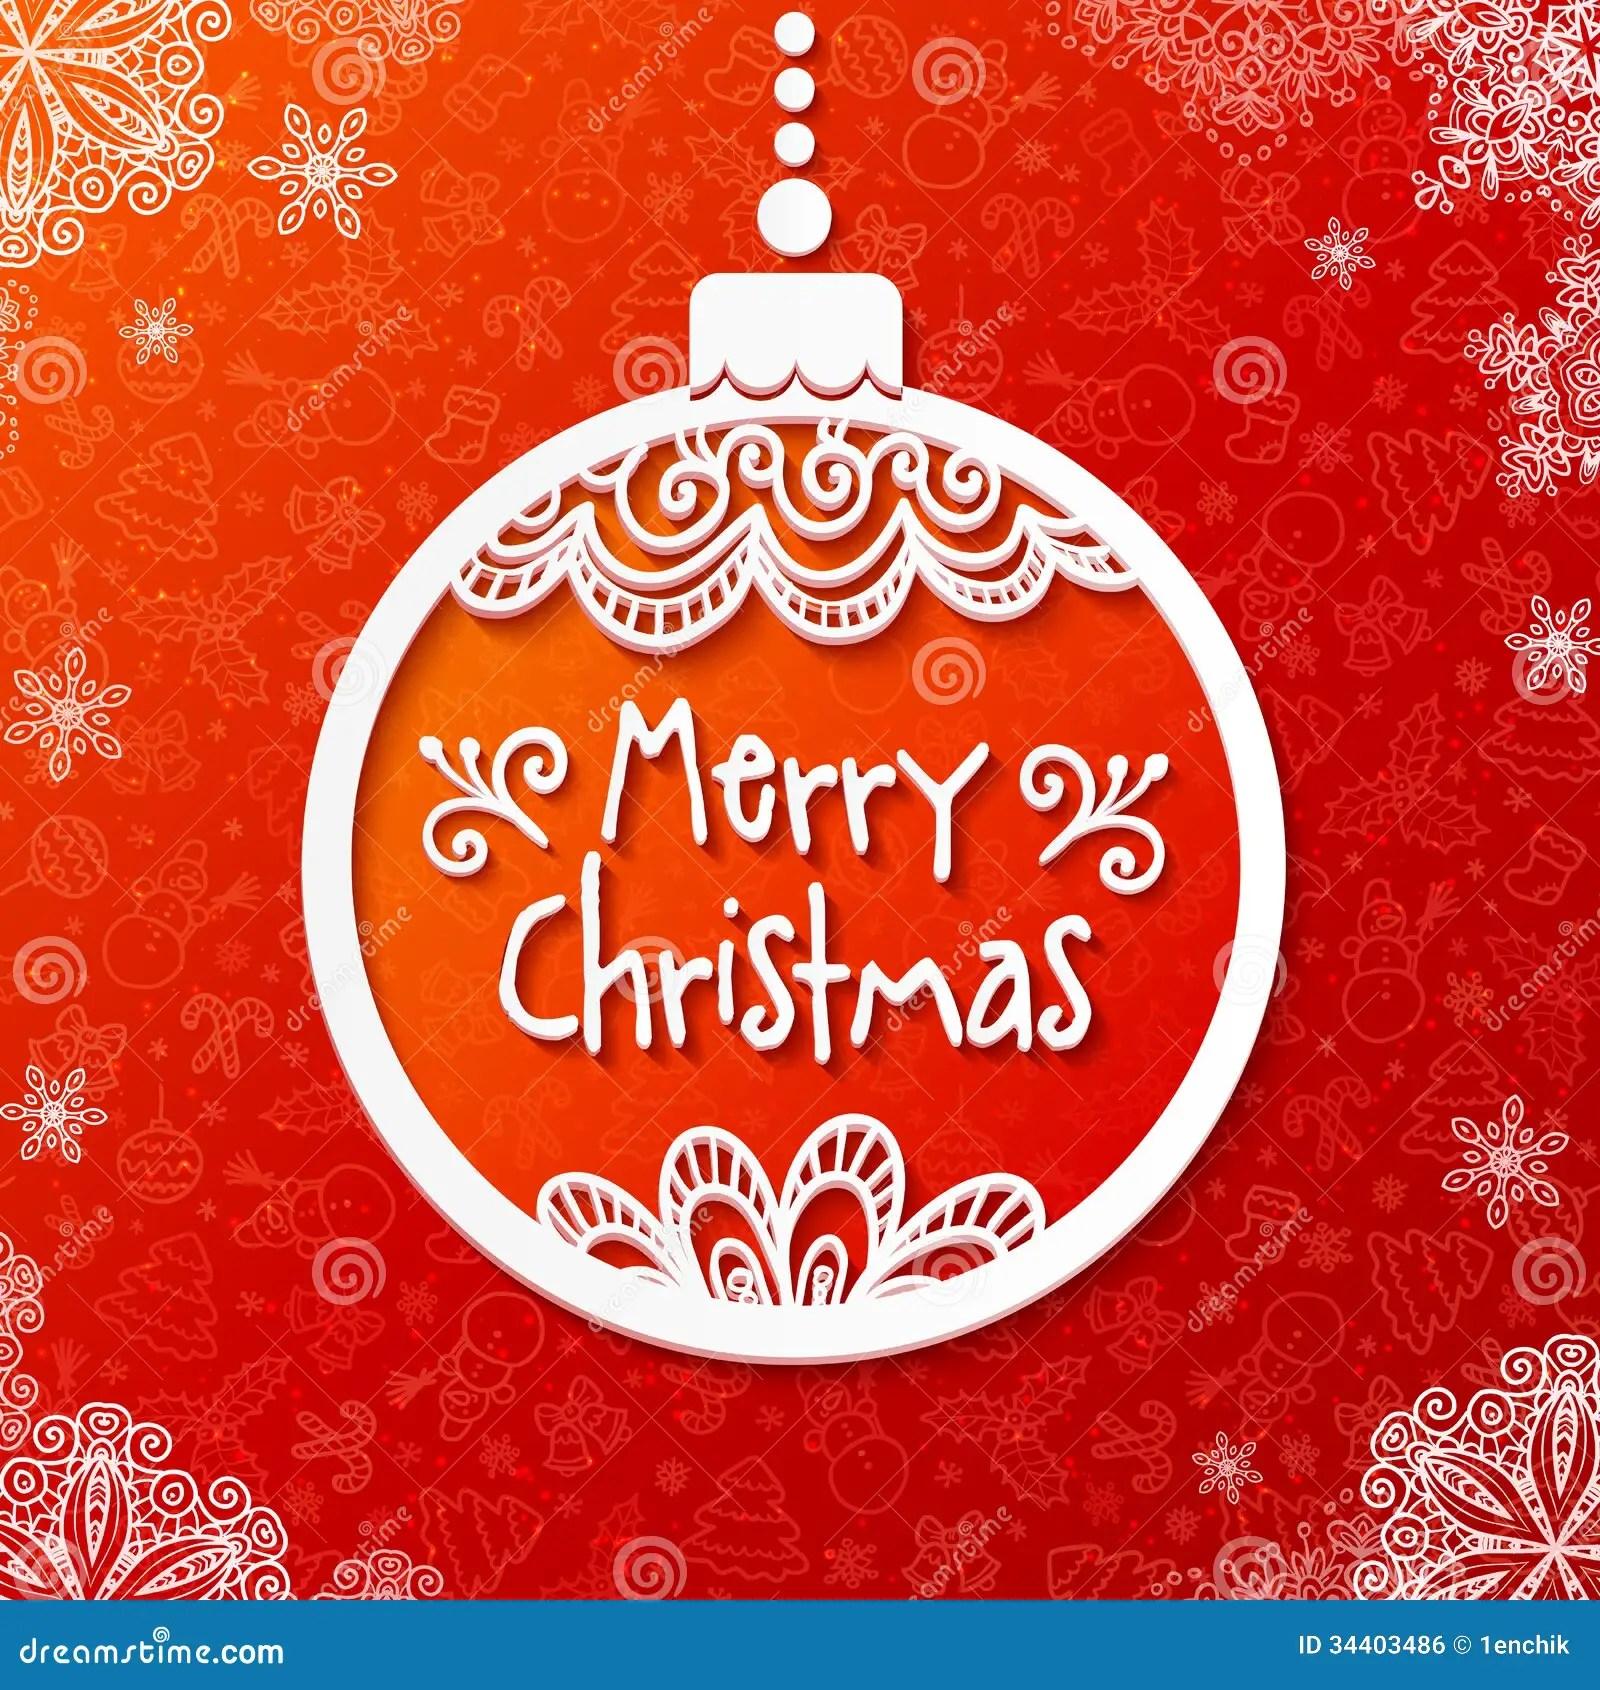 White Vector Paper Ornate Christmas Ball Royalty Free